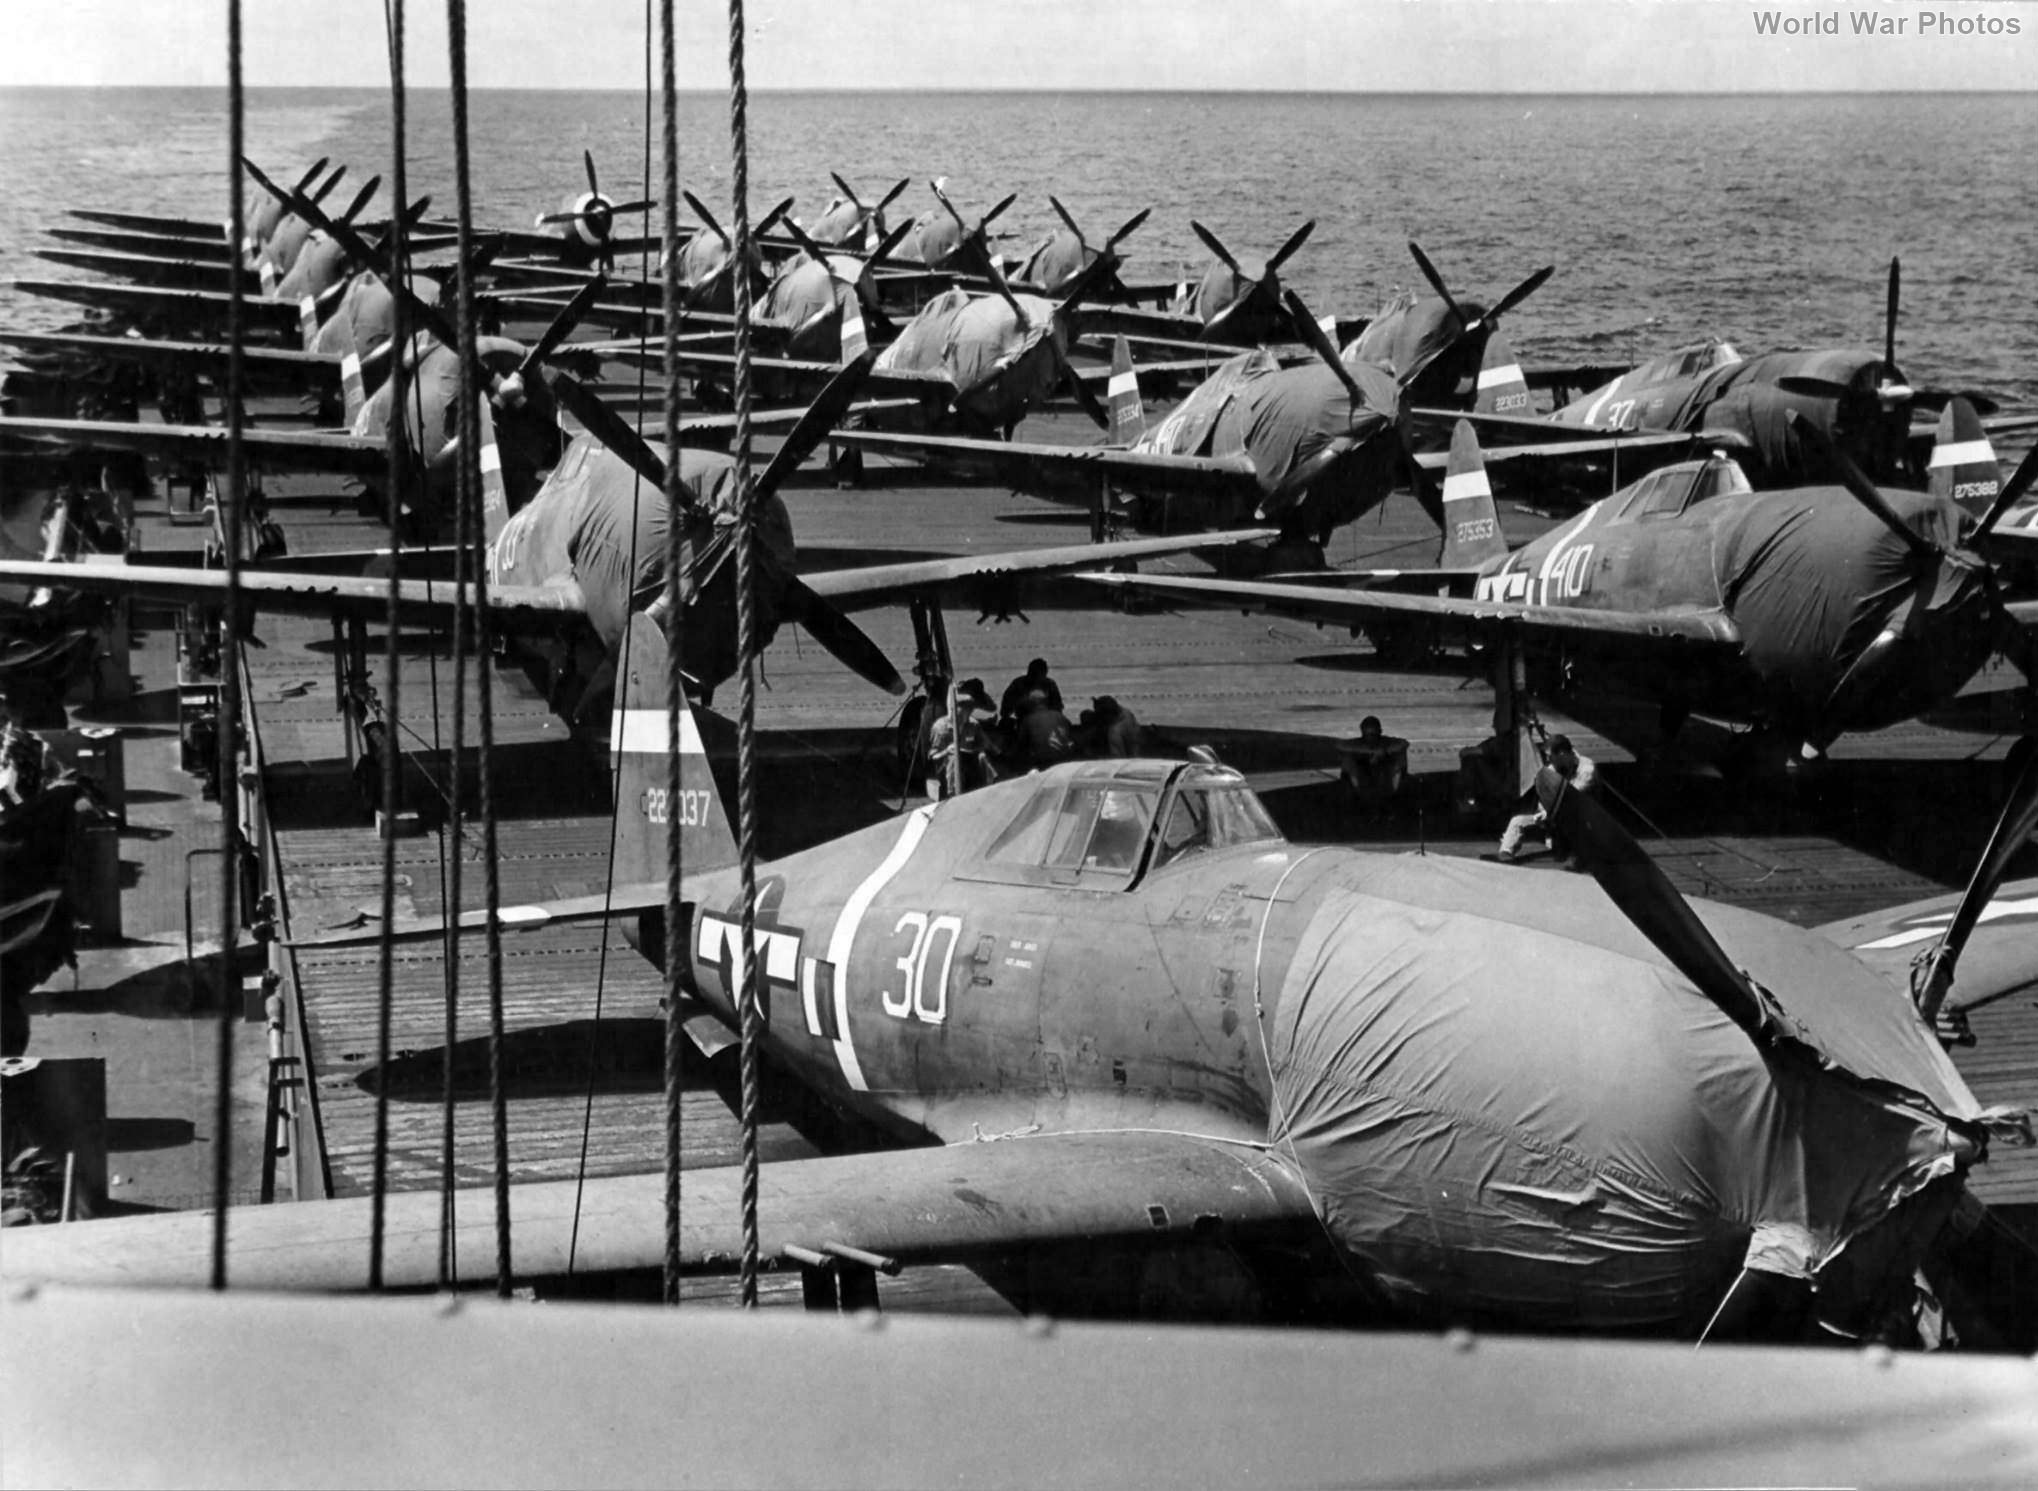 P-47s bound for Eniwetok USS Manilla Bay 13th June 44